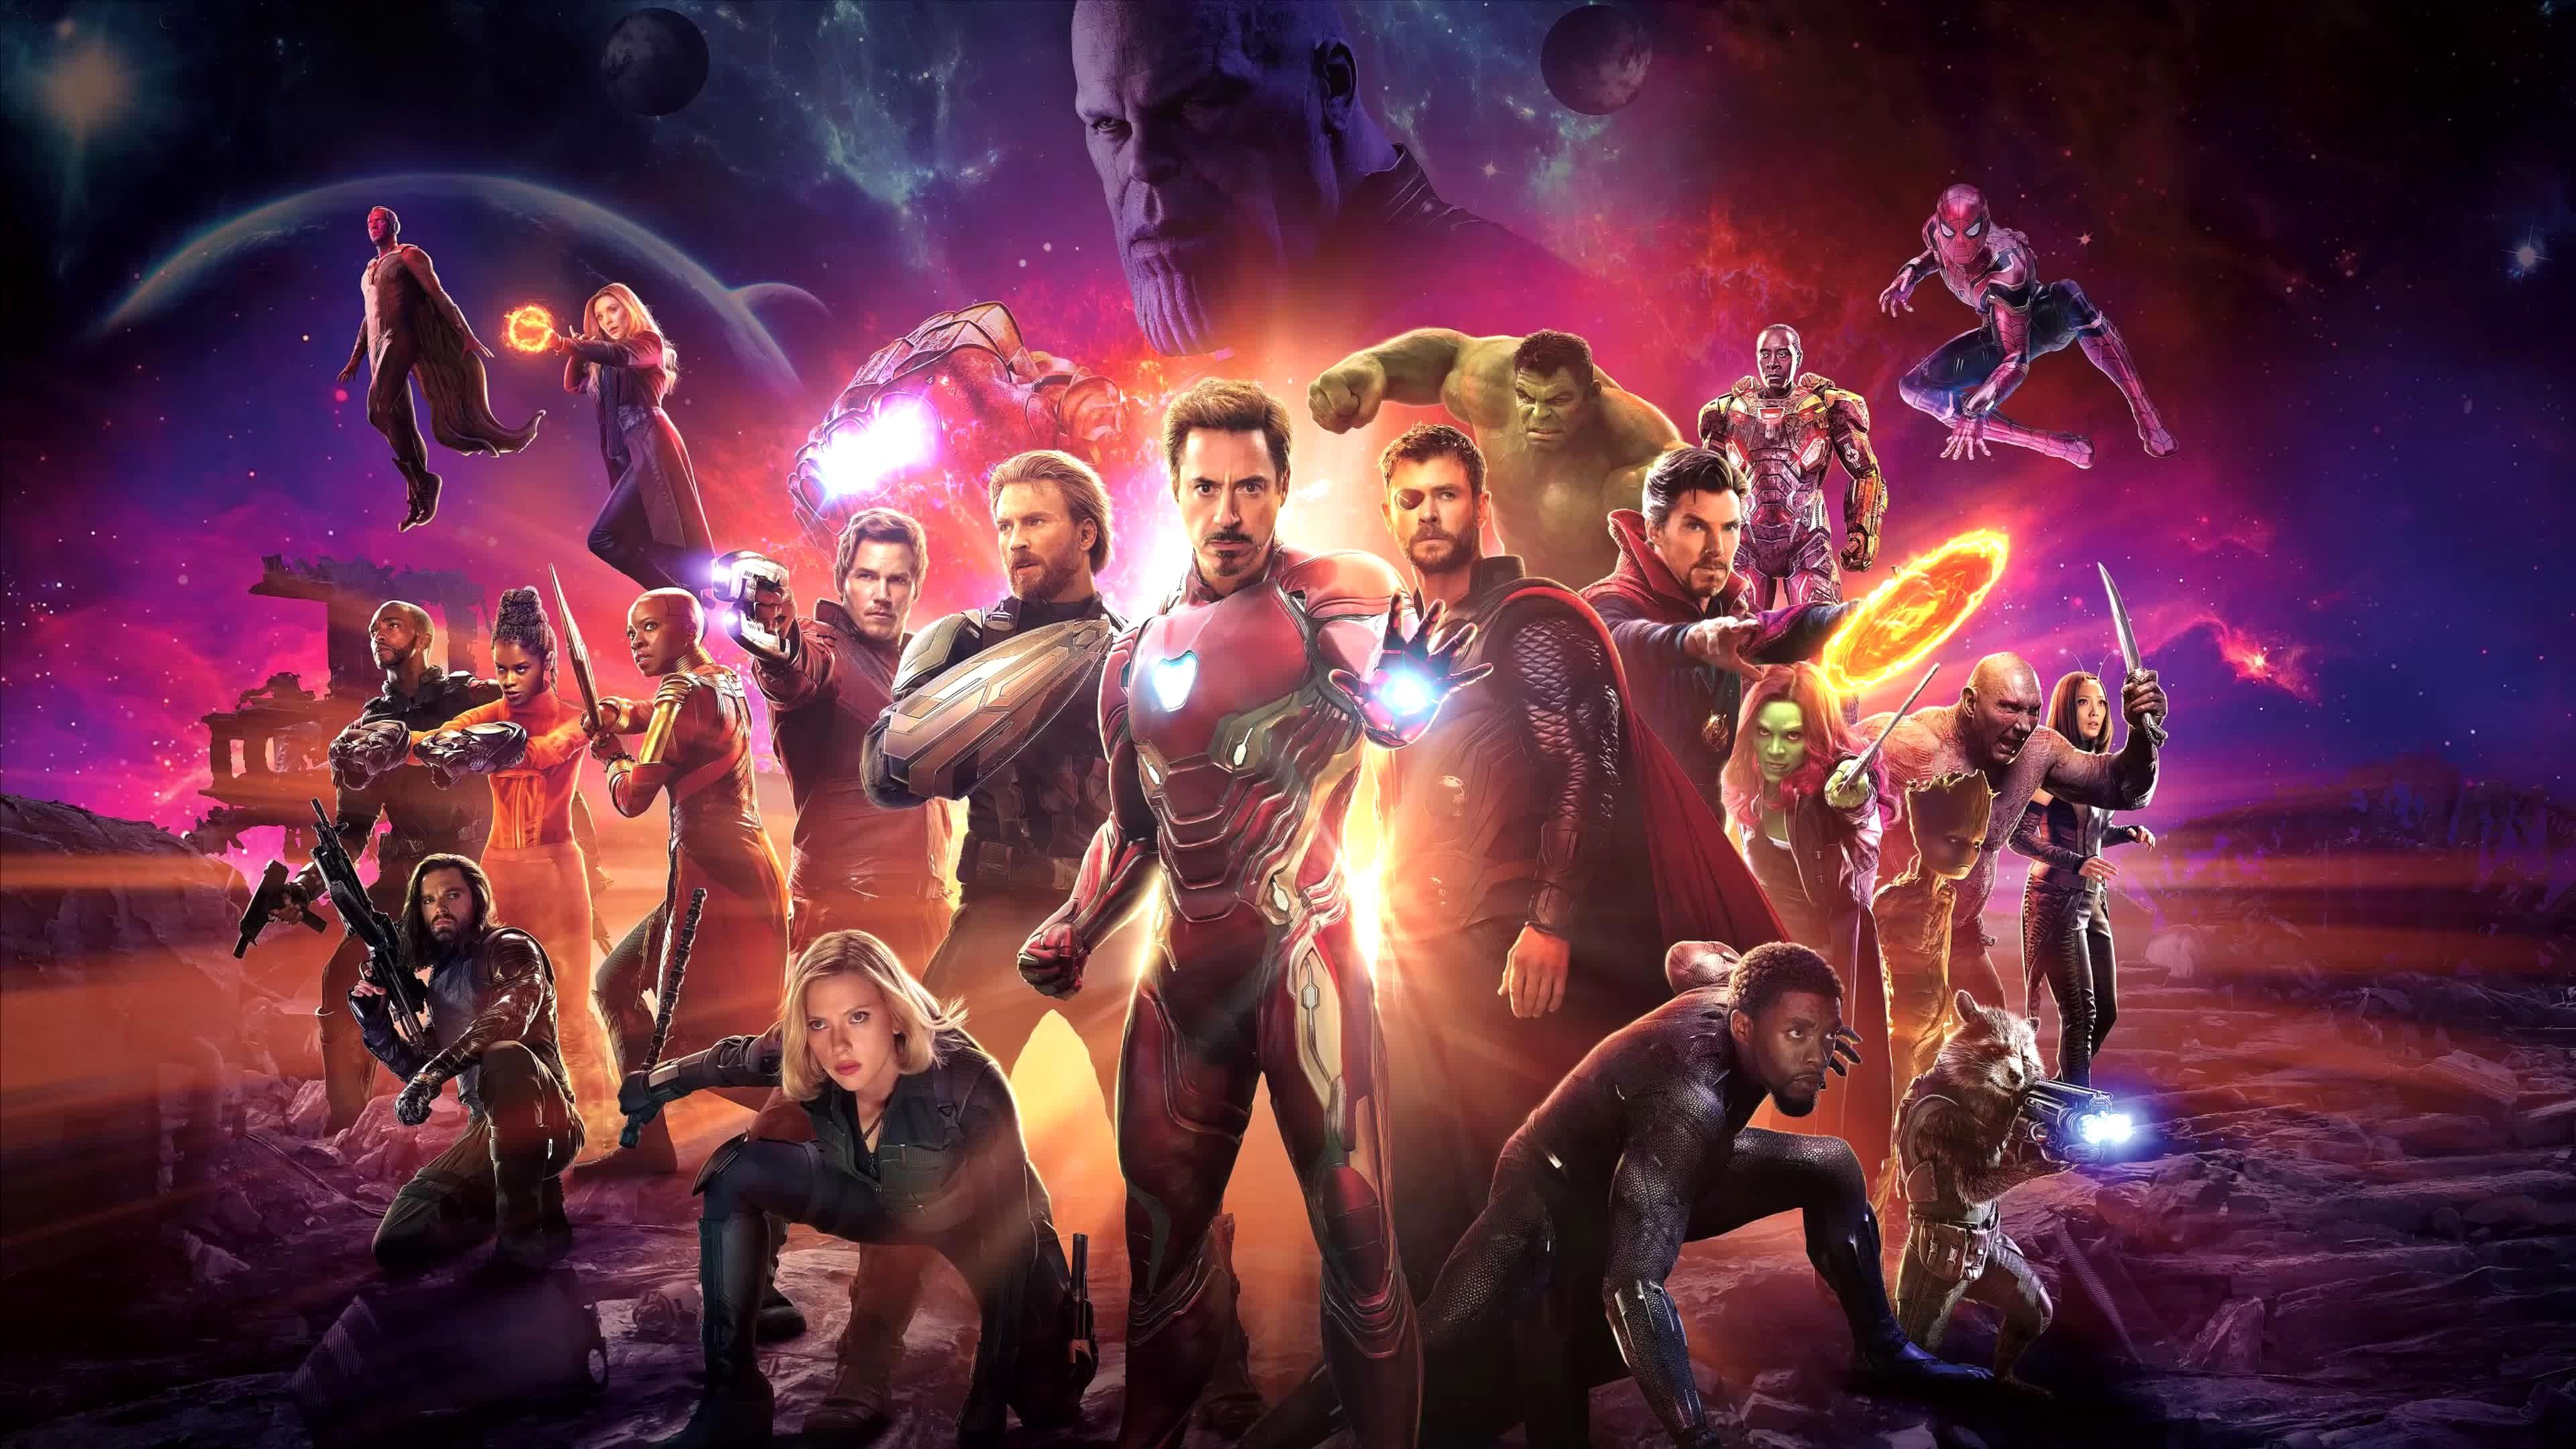 4k Wallpaper For Pc Avengers Ideas All Marvel Movies Avengers Actors Avengers Infinity War